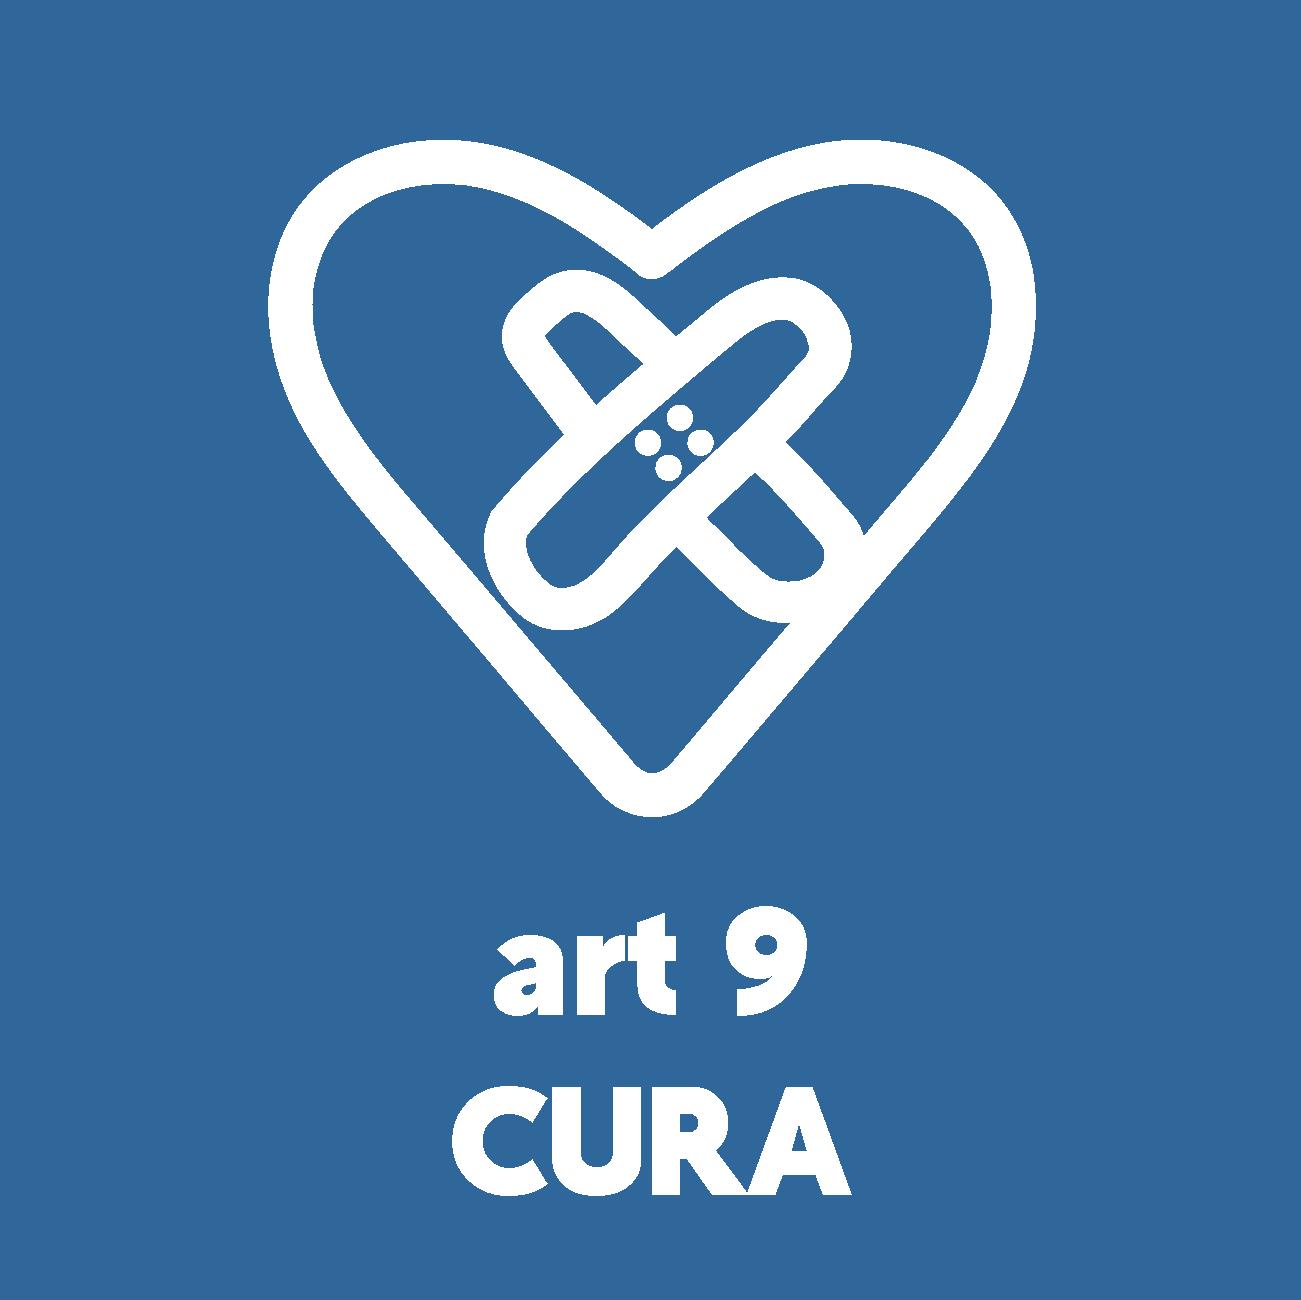 Art 09 care